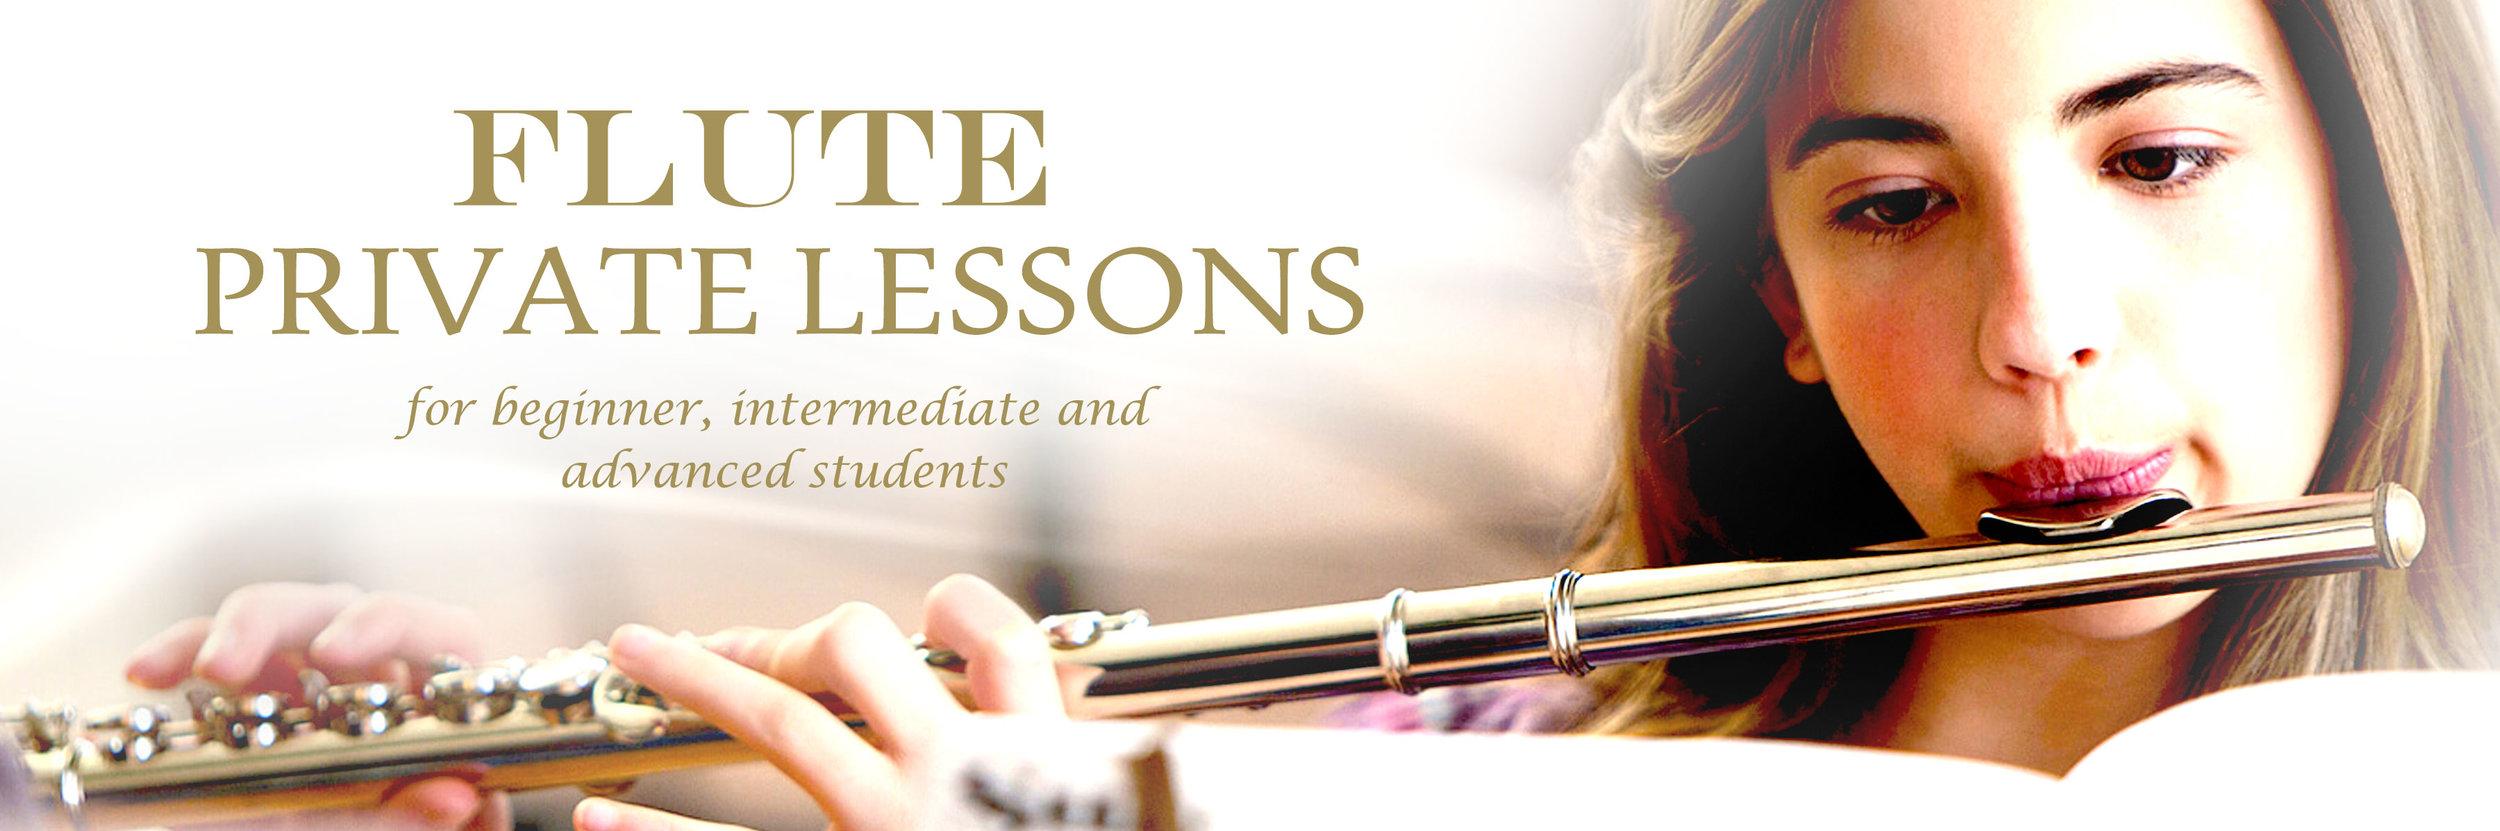 Flute-Main-Image.jpg